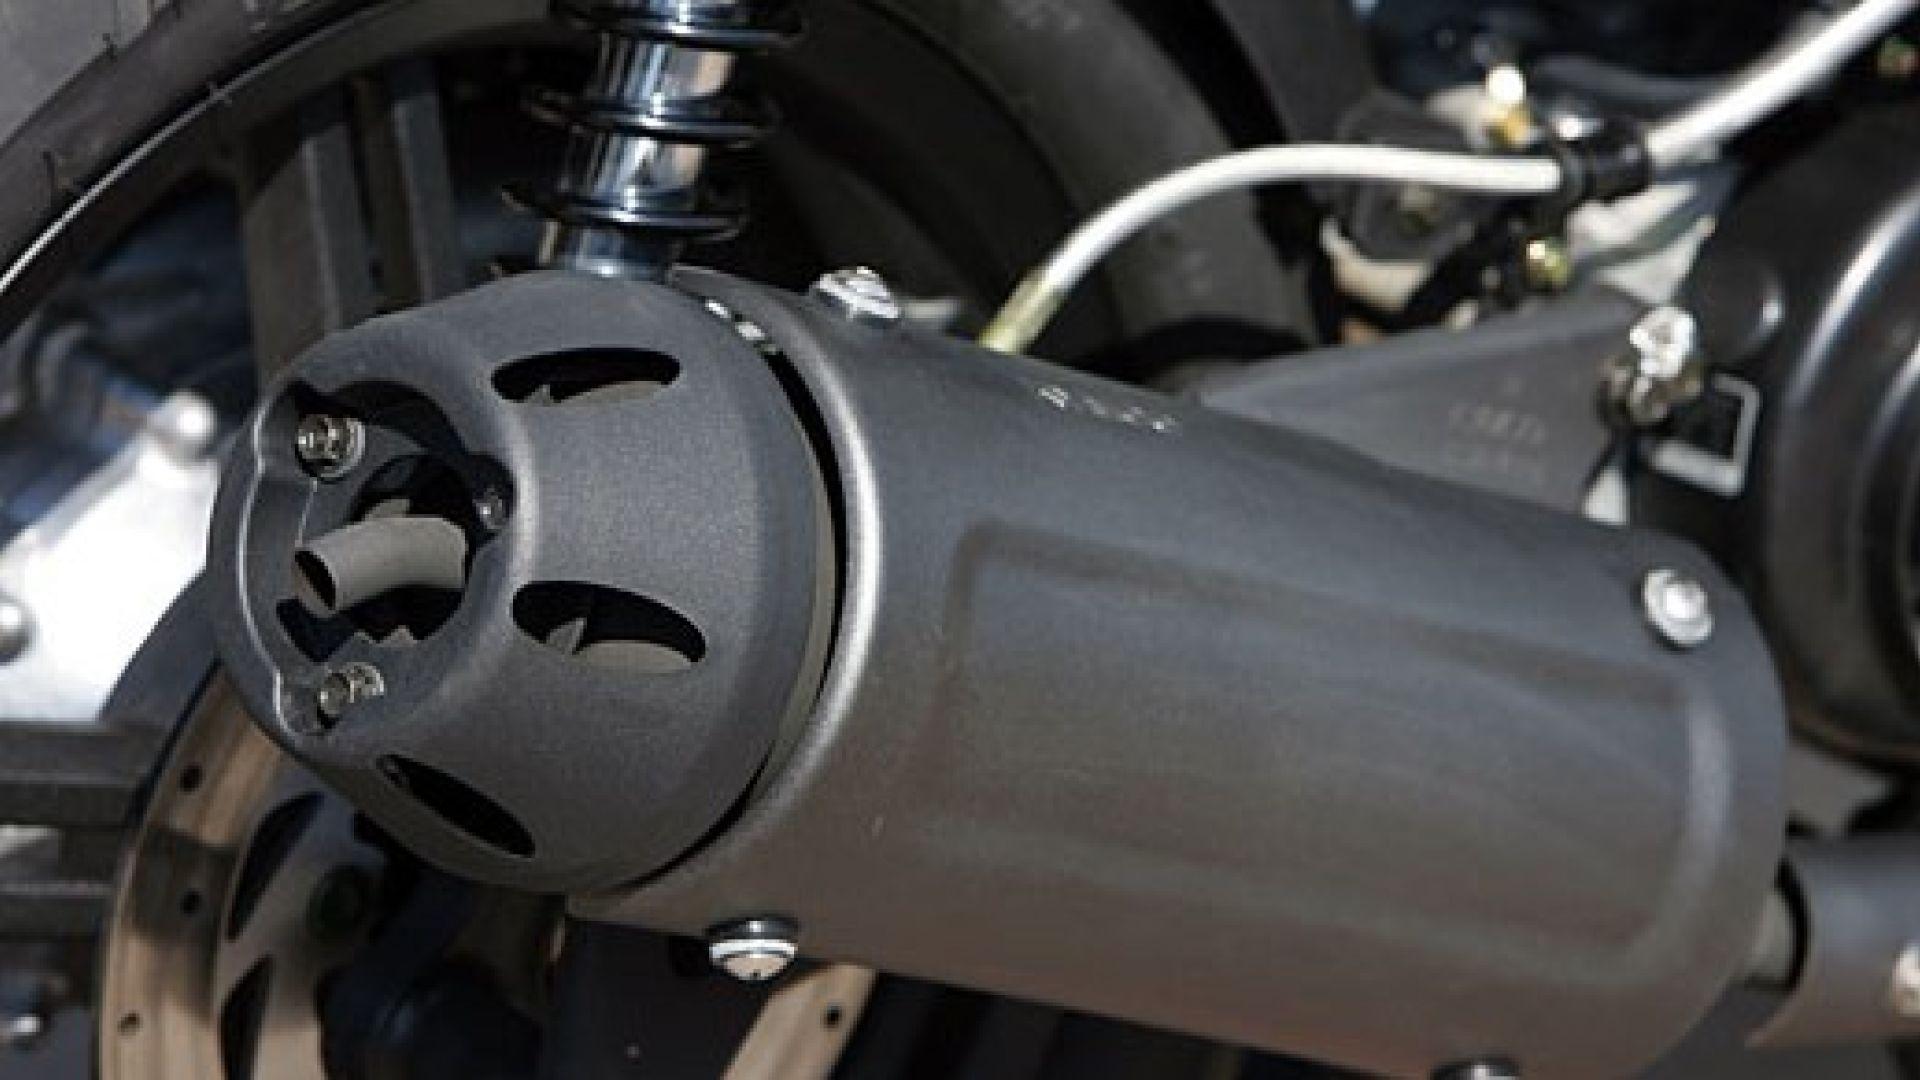 prova: kymco agility r16 - motorbox